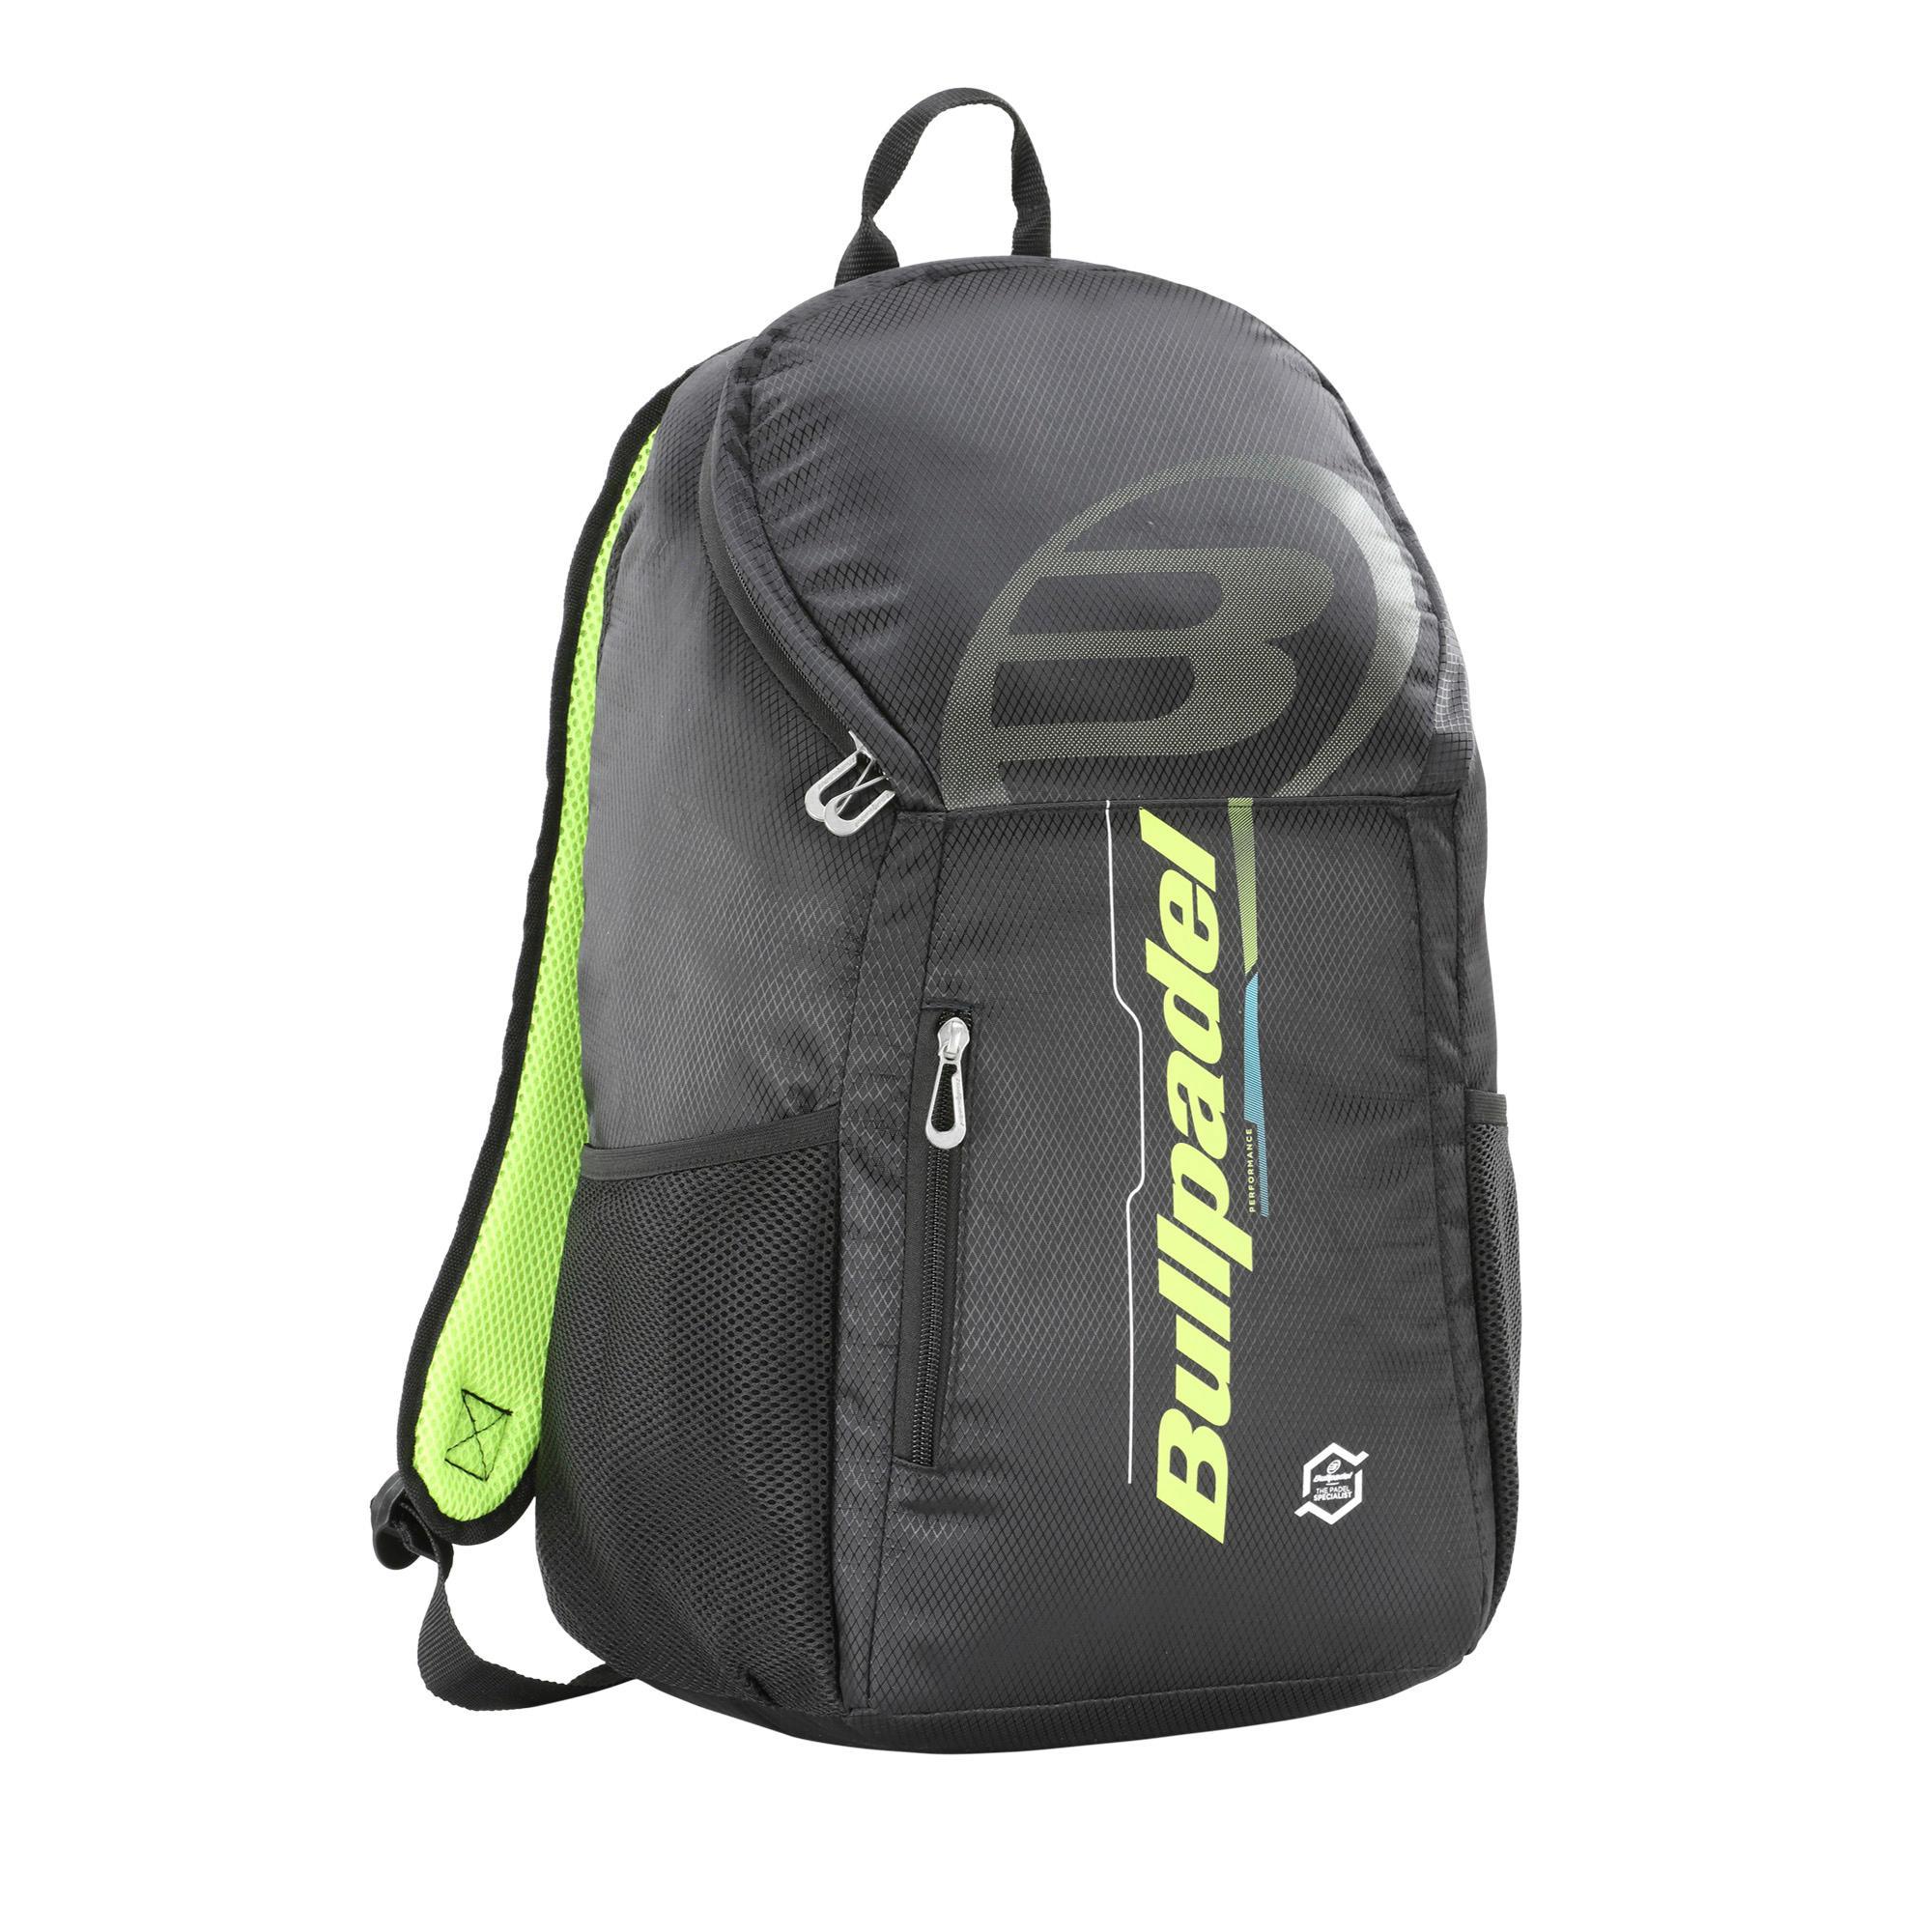 Rucsac BULLPADEL PRO Backpack imagine